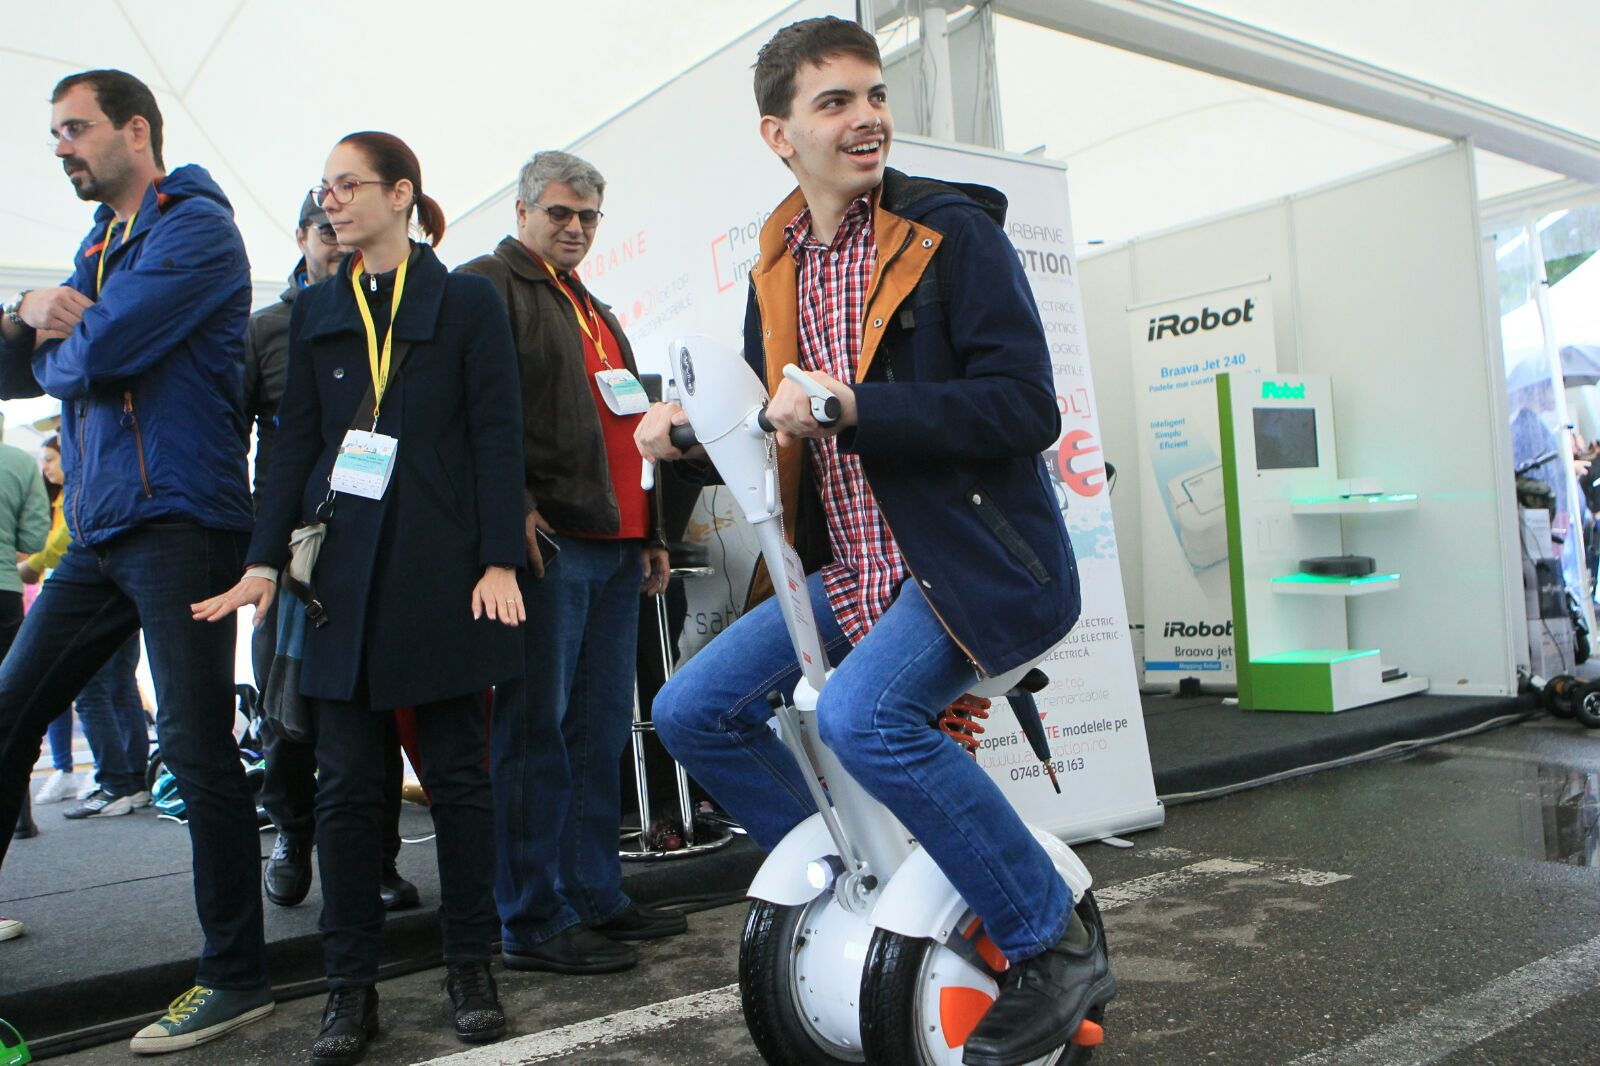 Cele mai bune momente din Bucharest Technology Week 2017